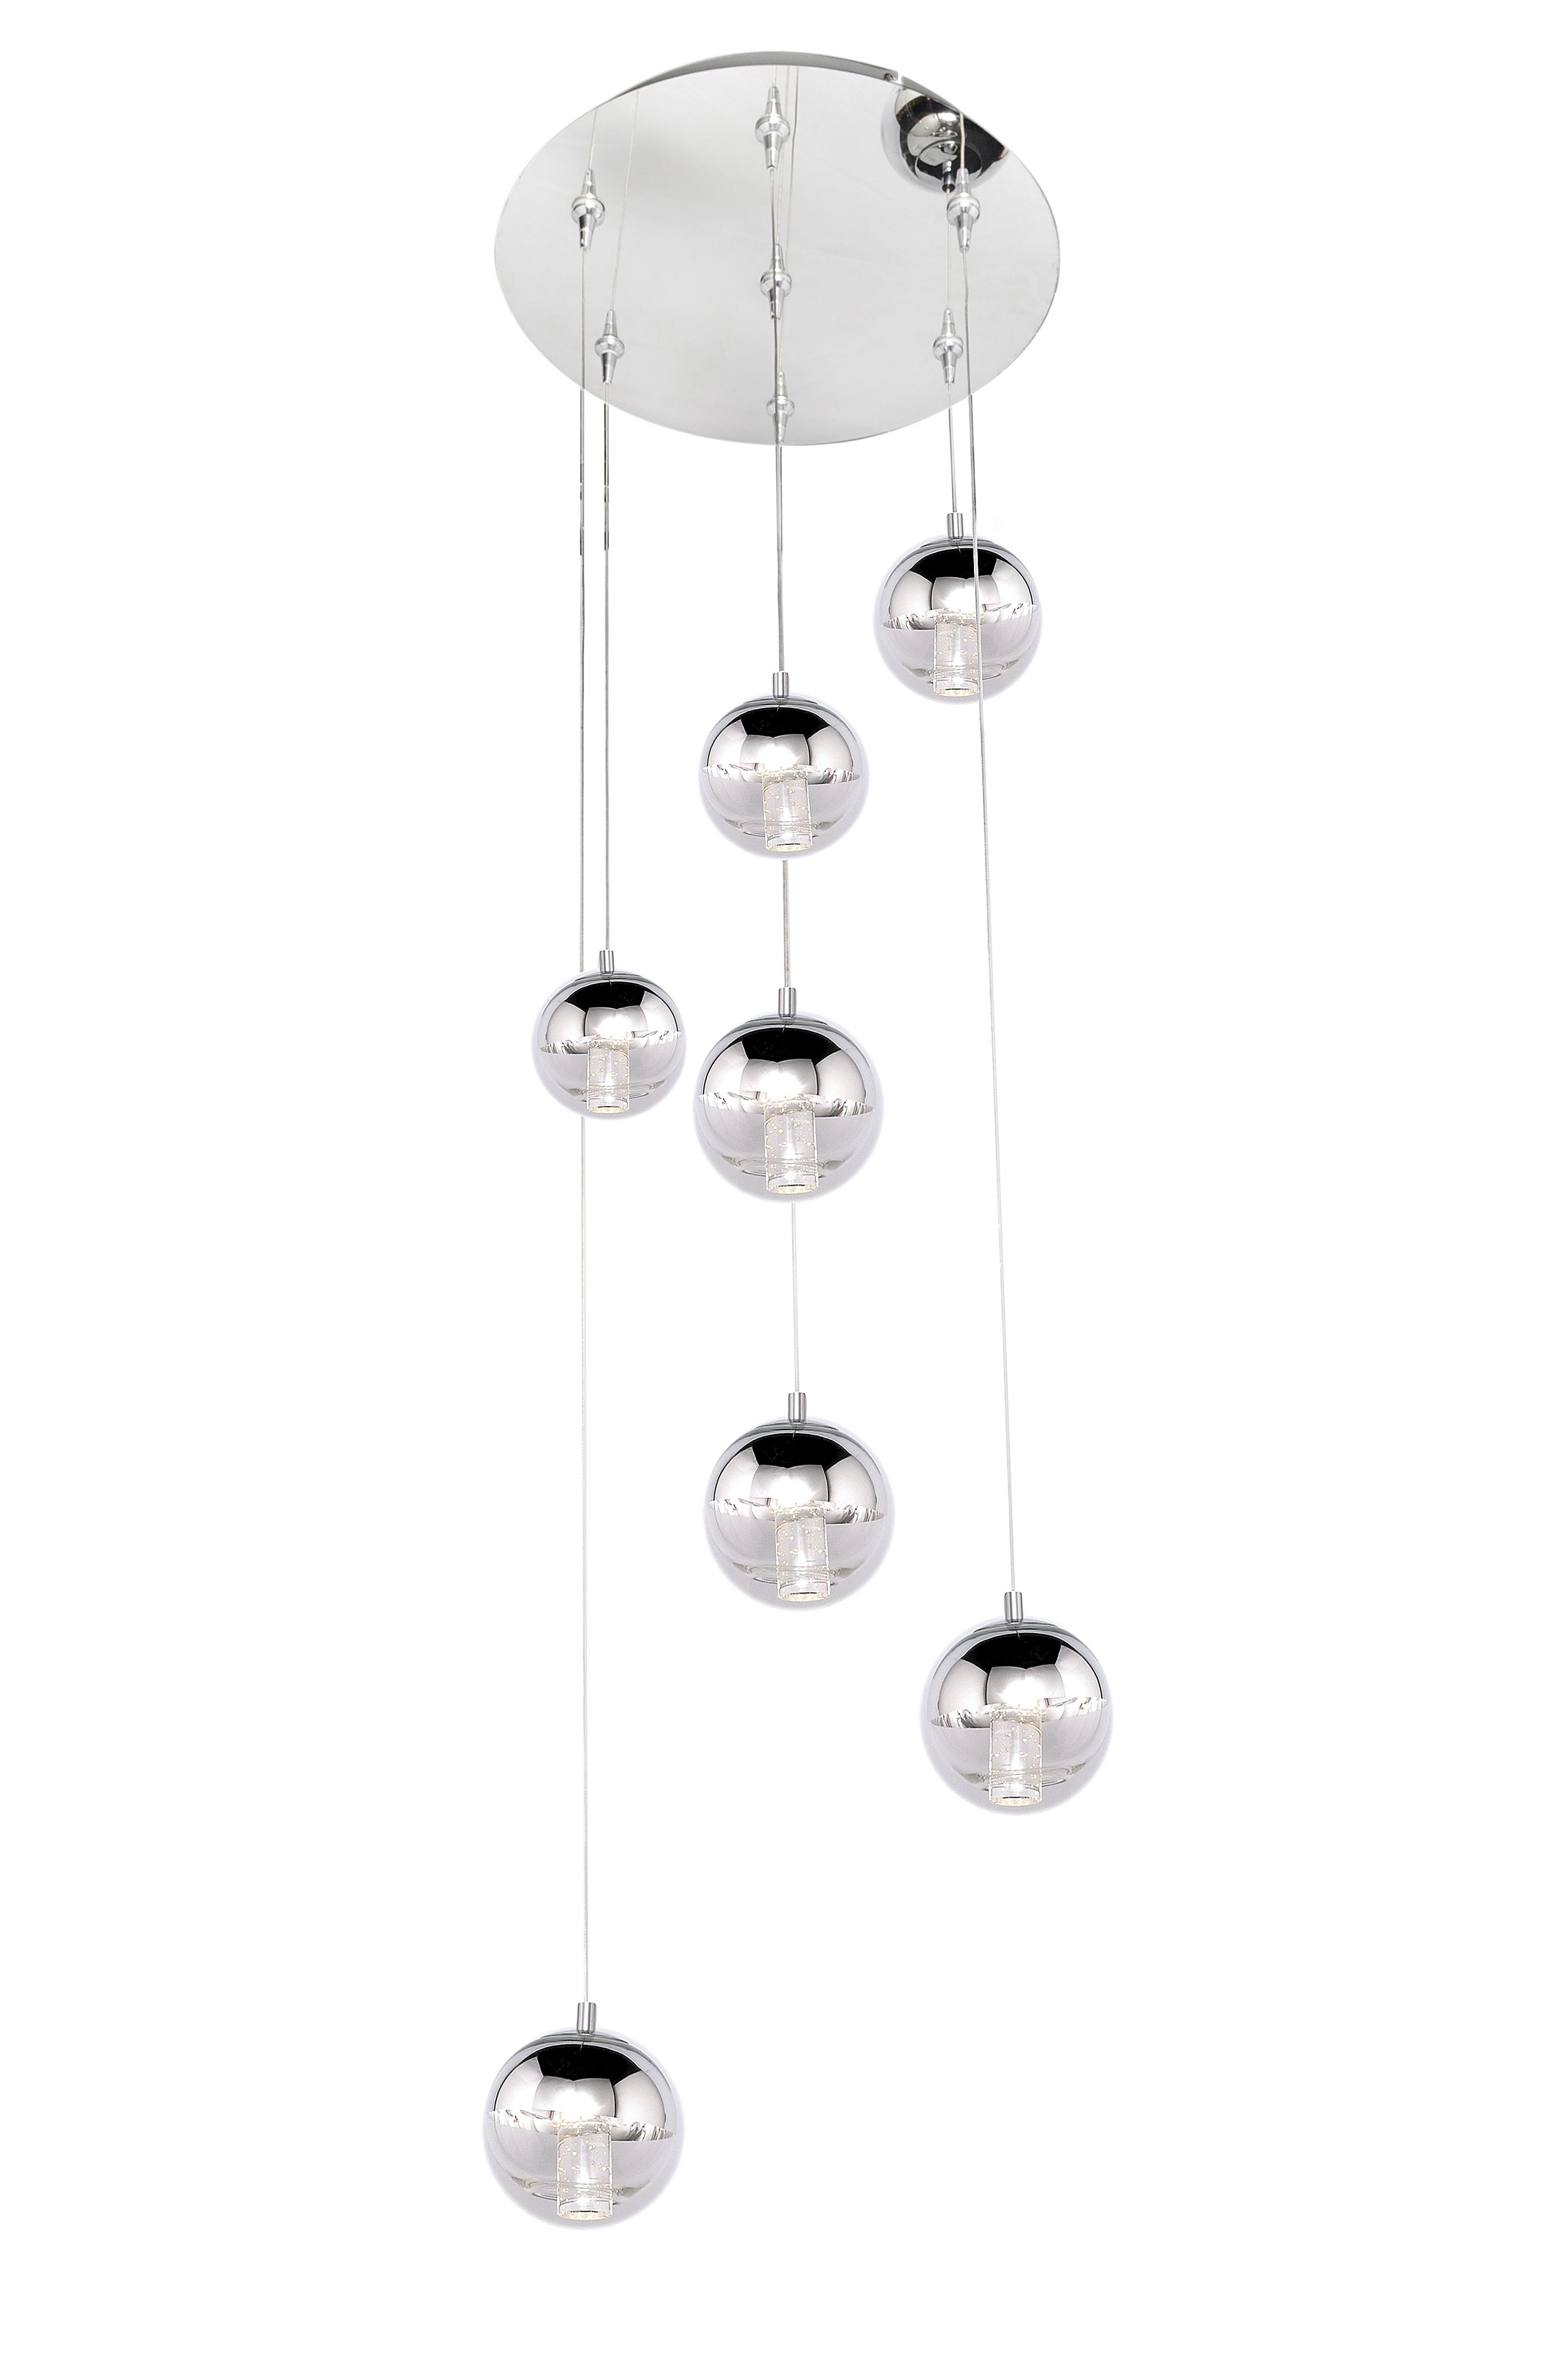 Zing 7-Light RapidJack Pendant and Canopy